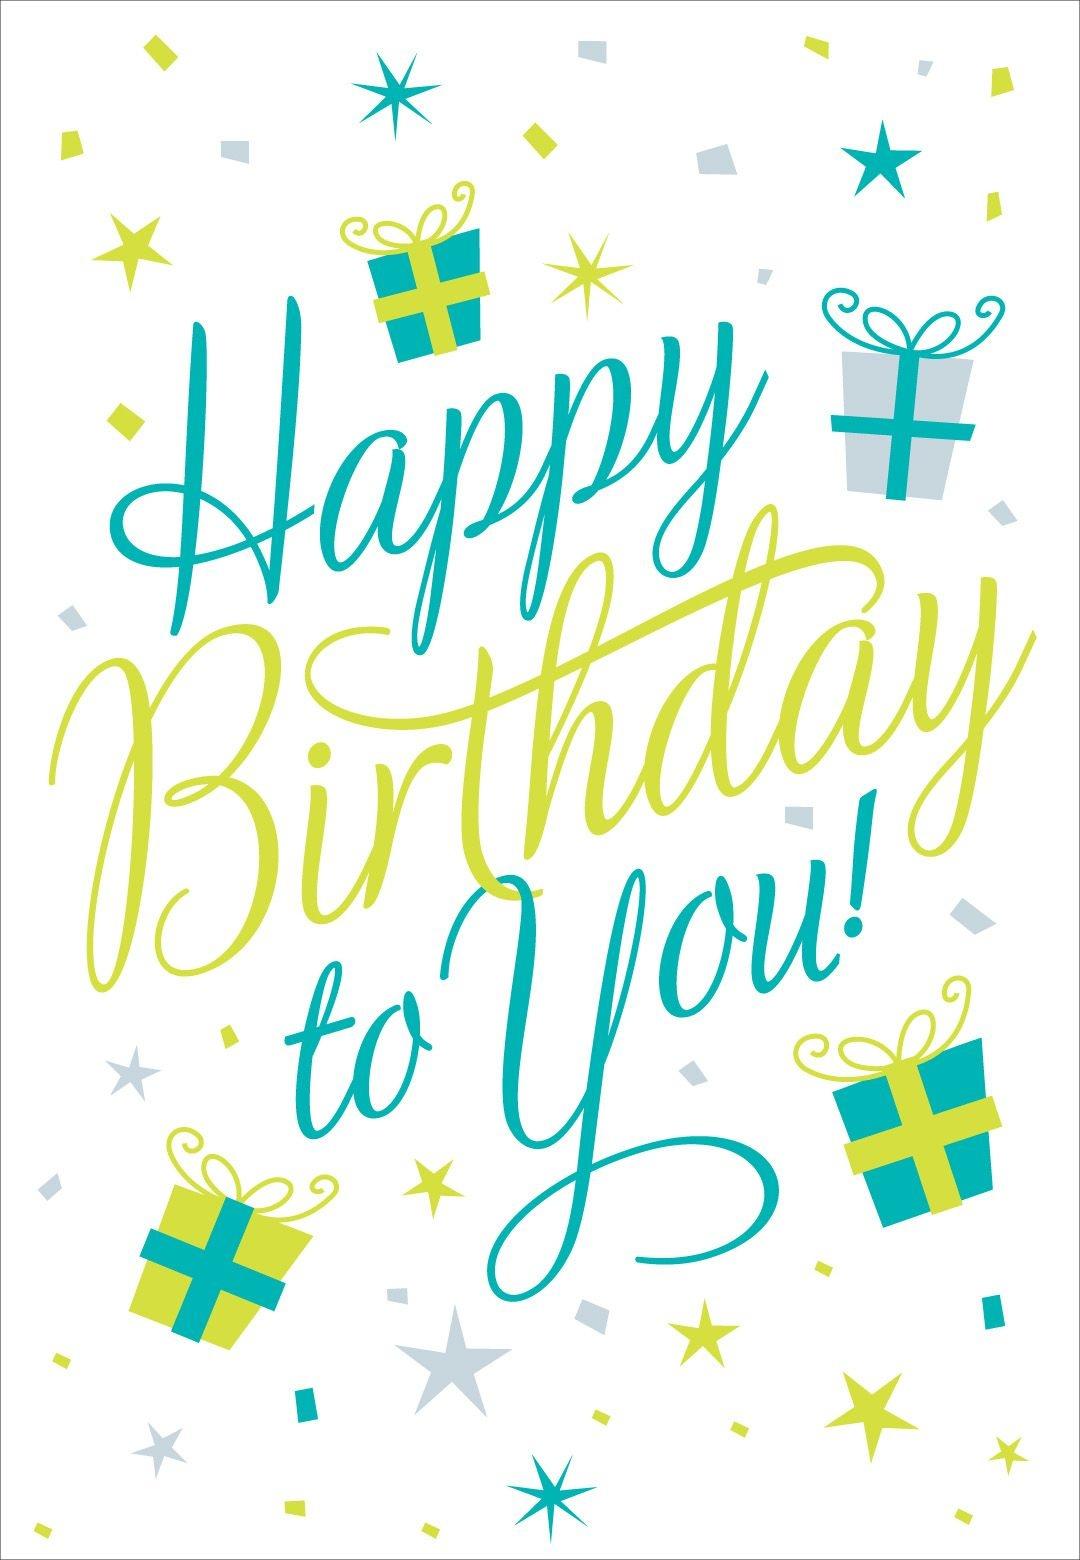 Free Printable Happy Birthday To You Greeting Card #birthday - Free Printable Happy Birthday Cards